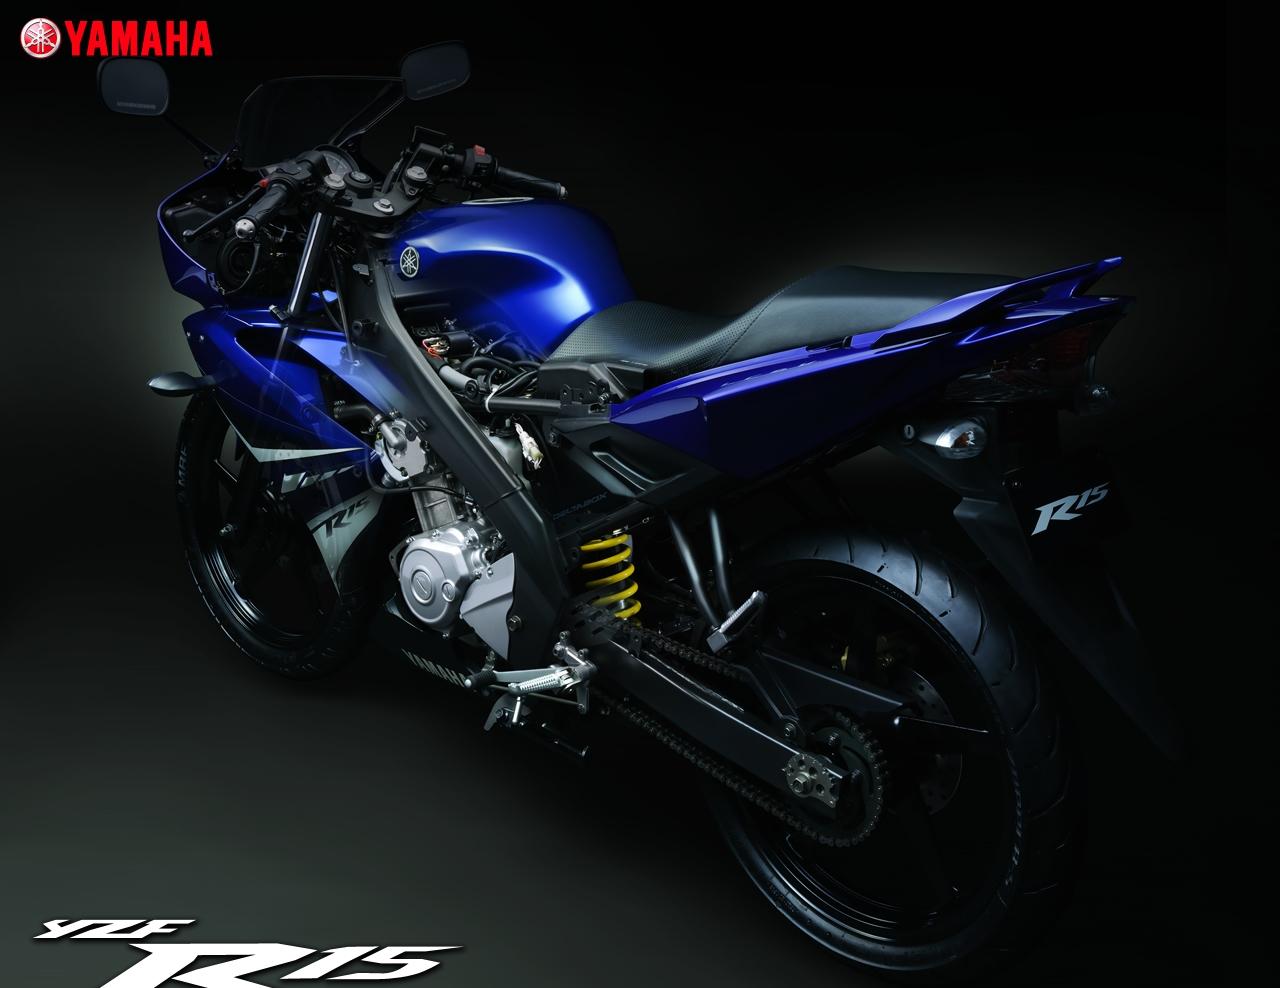 Yamaha YZF R15 - Specs and Photo - MotorSpeed Freakz